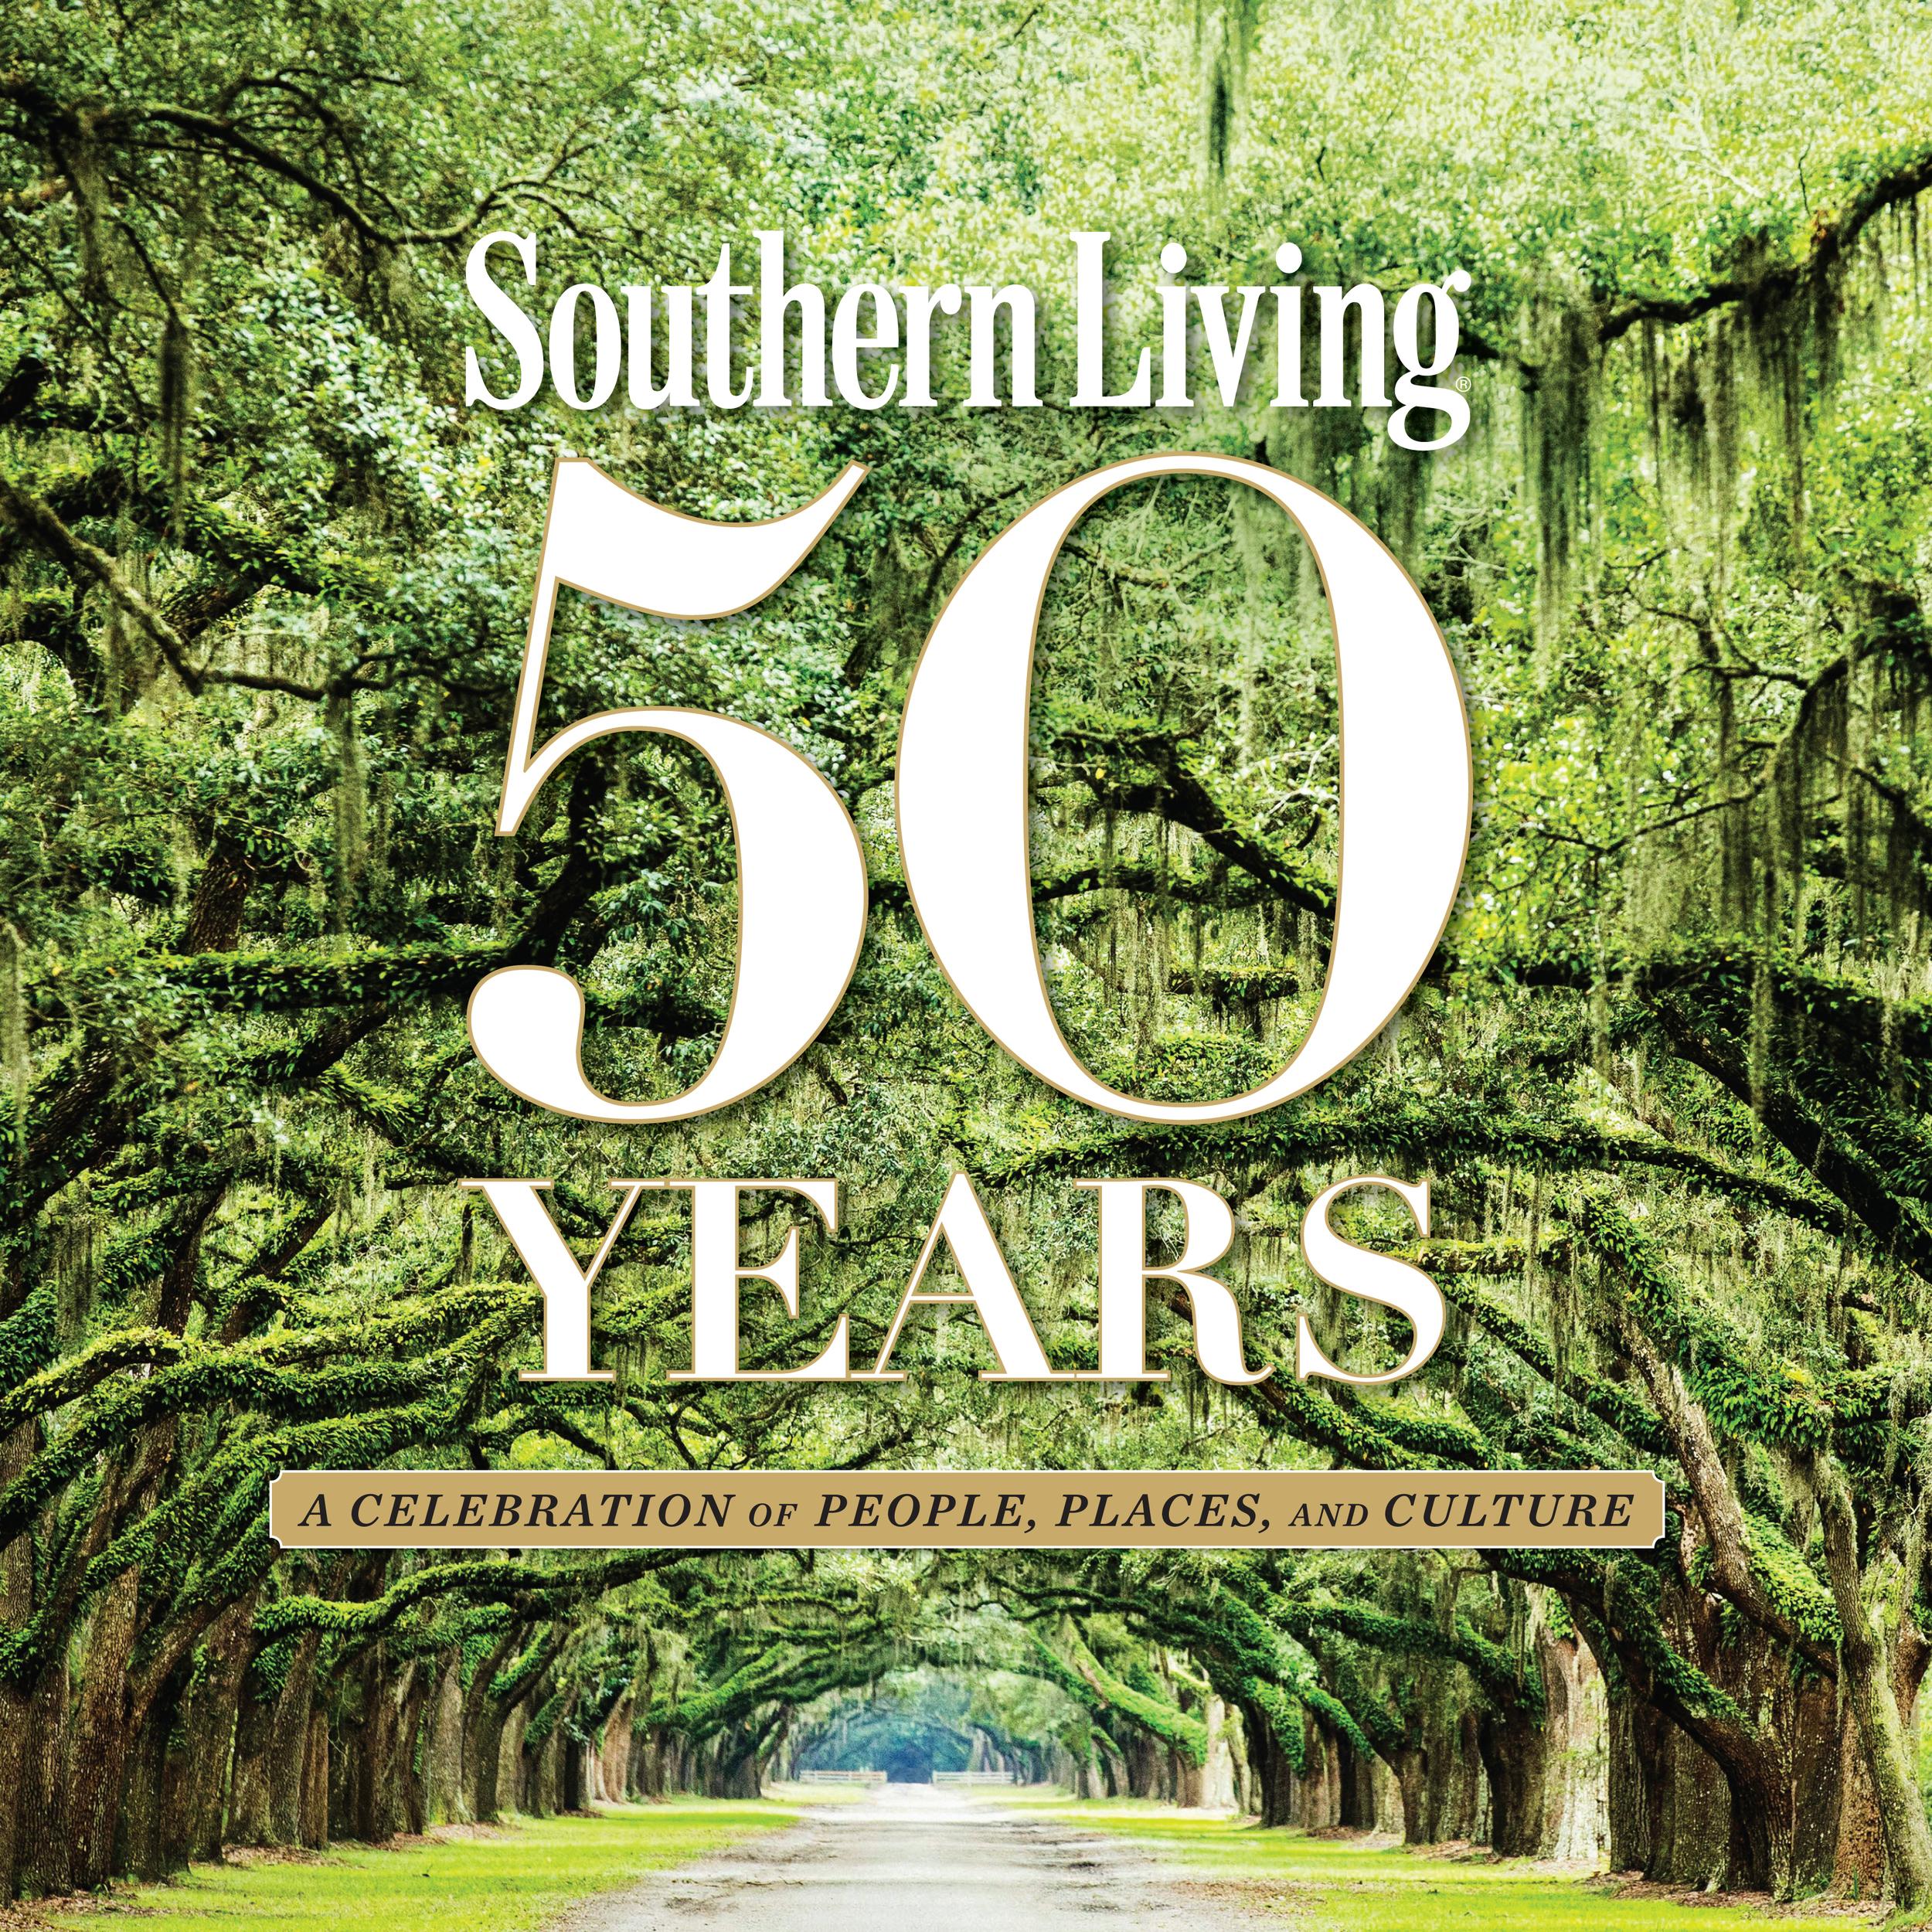 Southern Living 50 Years.jpg